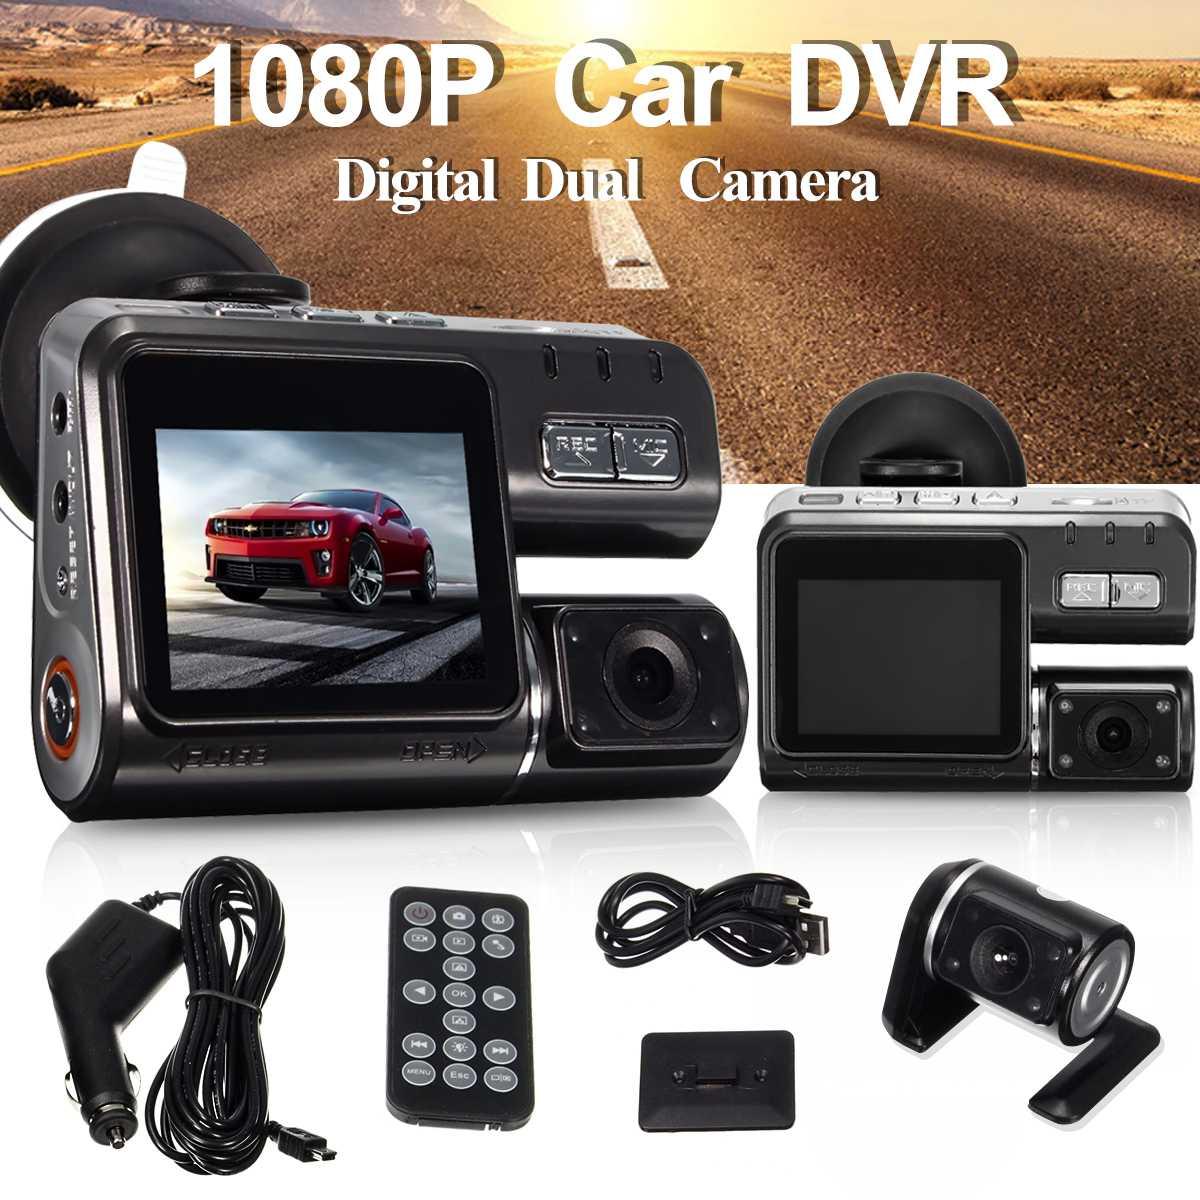 Full HD 1080P Car Vehicle DVR Camera Dash Cam Video Record G Sensor Dual Lens Dvr Cameras and Rear View CameraFull HD 1080P Car Vehicle DVR Camera Dash Cam Video Record G Sensor Dual Lens Dvr Cameras and Rear View Camera